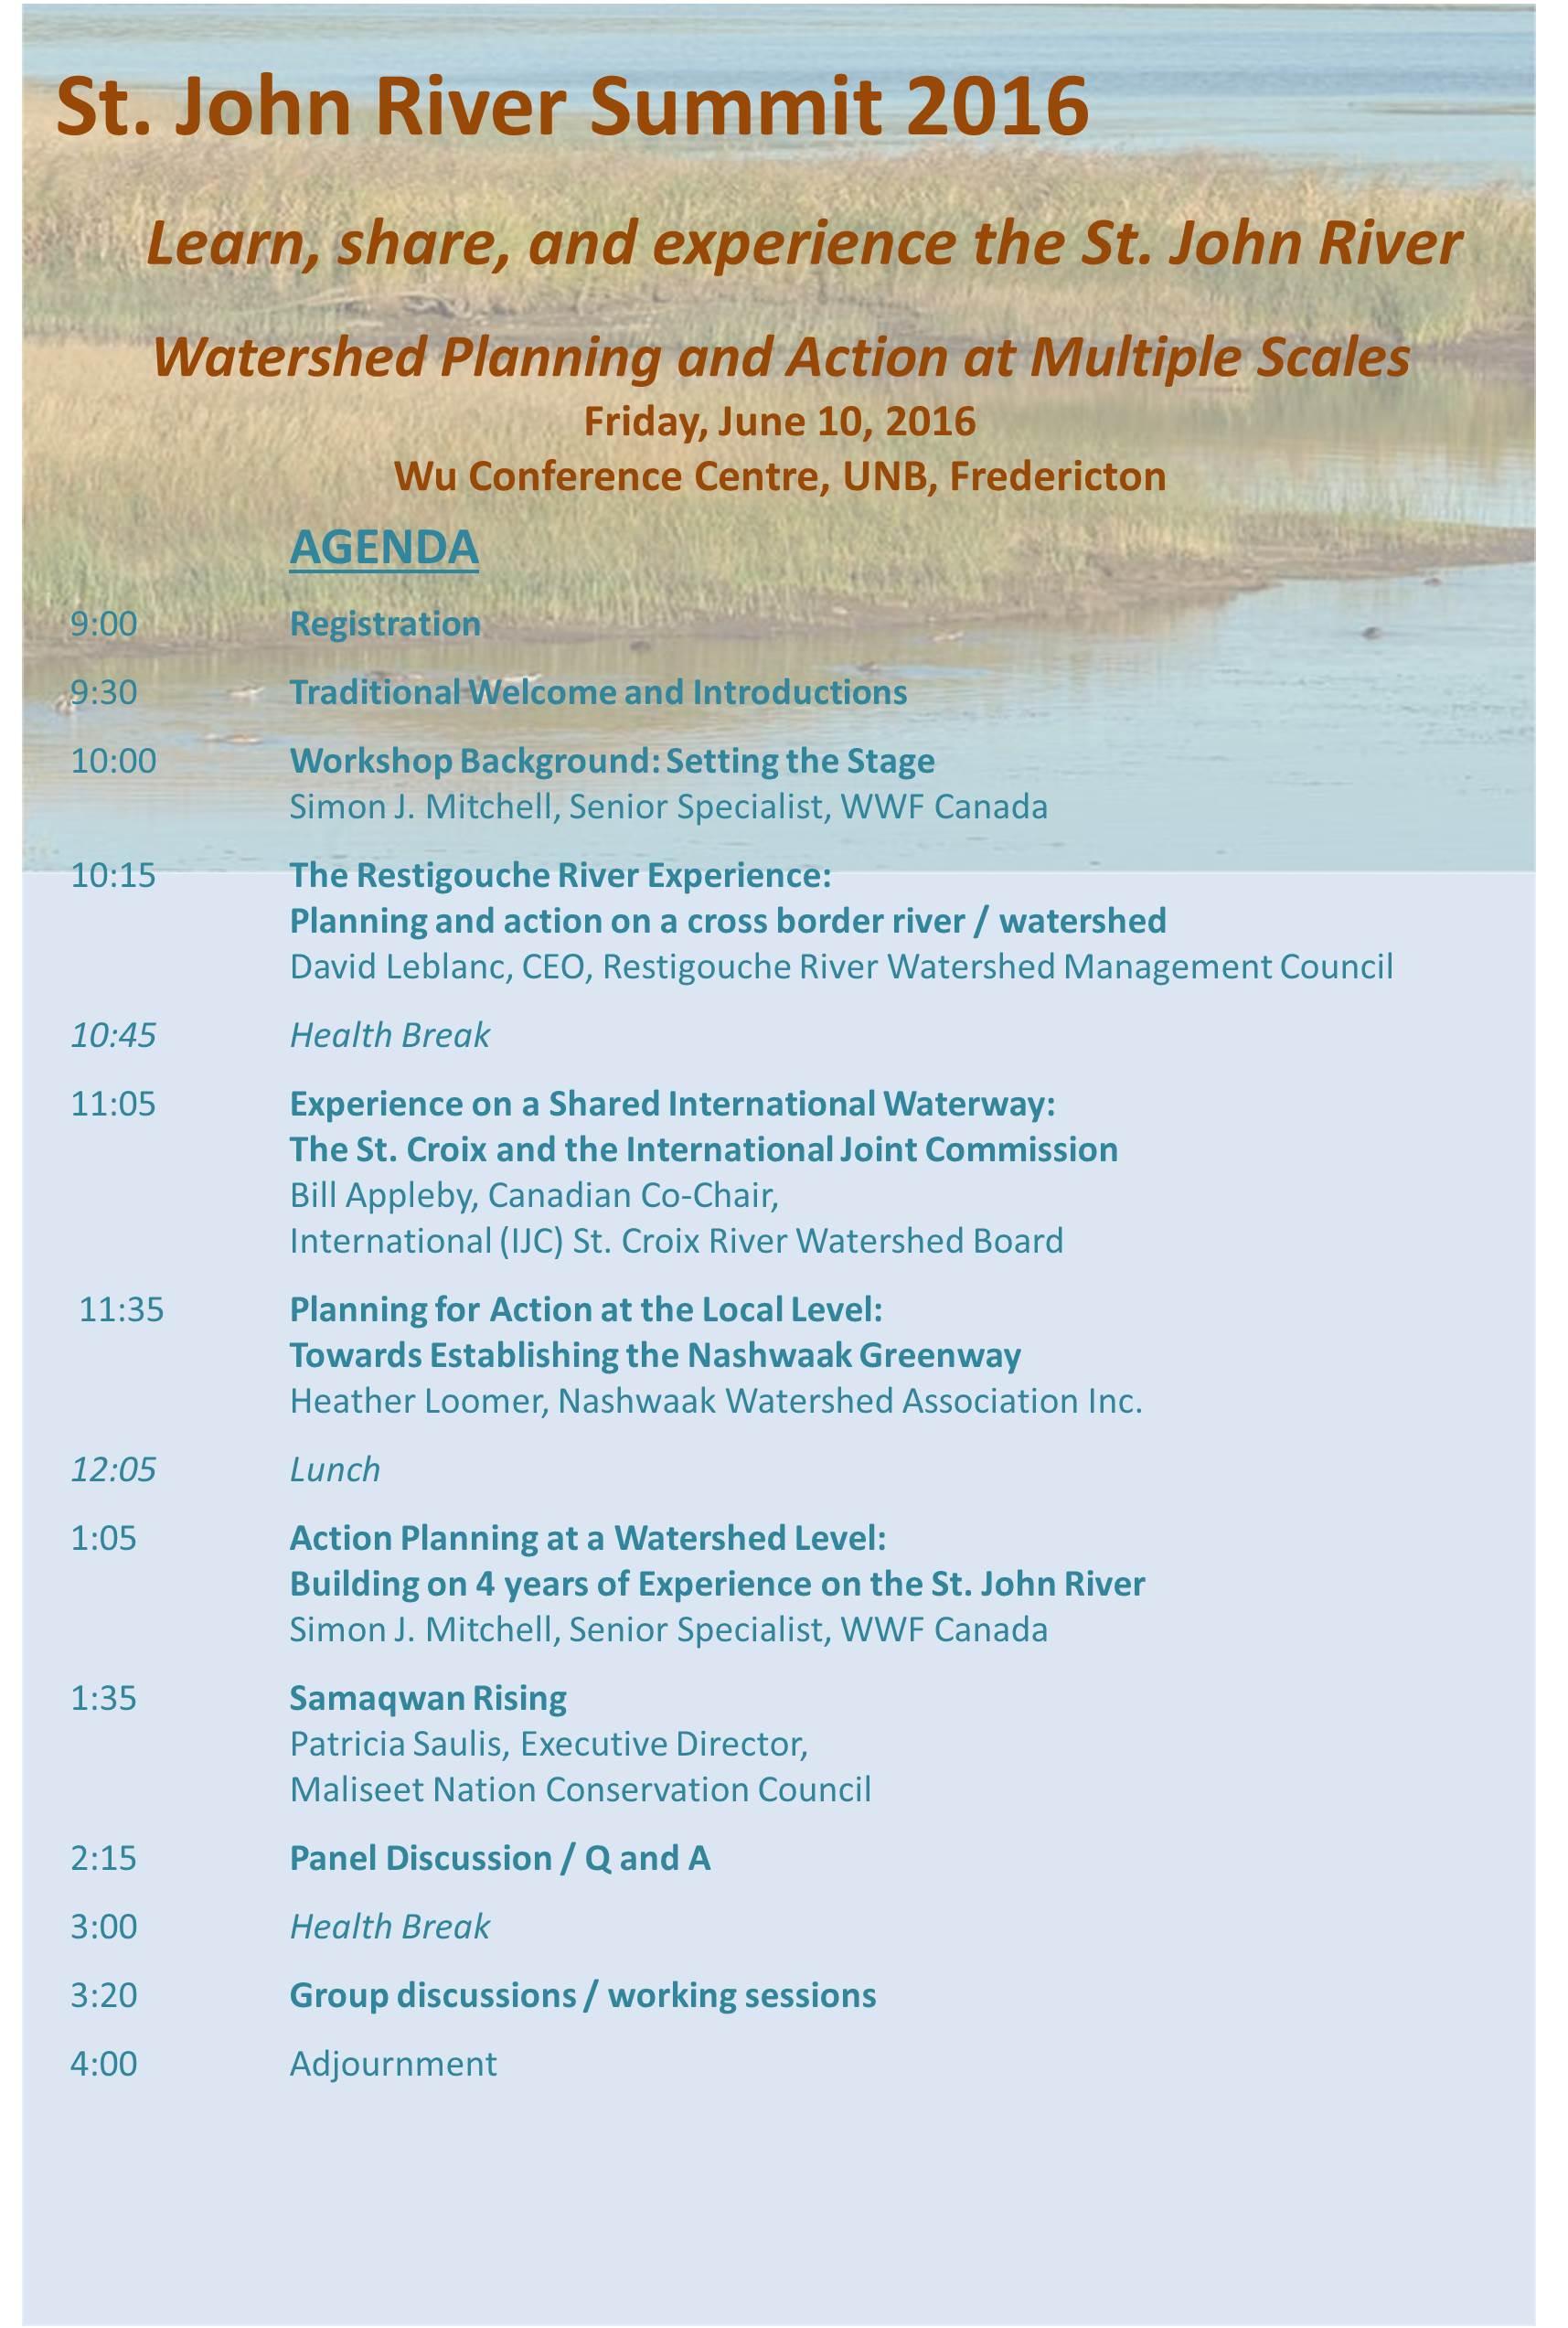 summit agenda_May 16